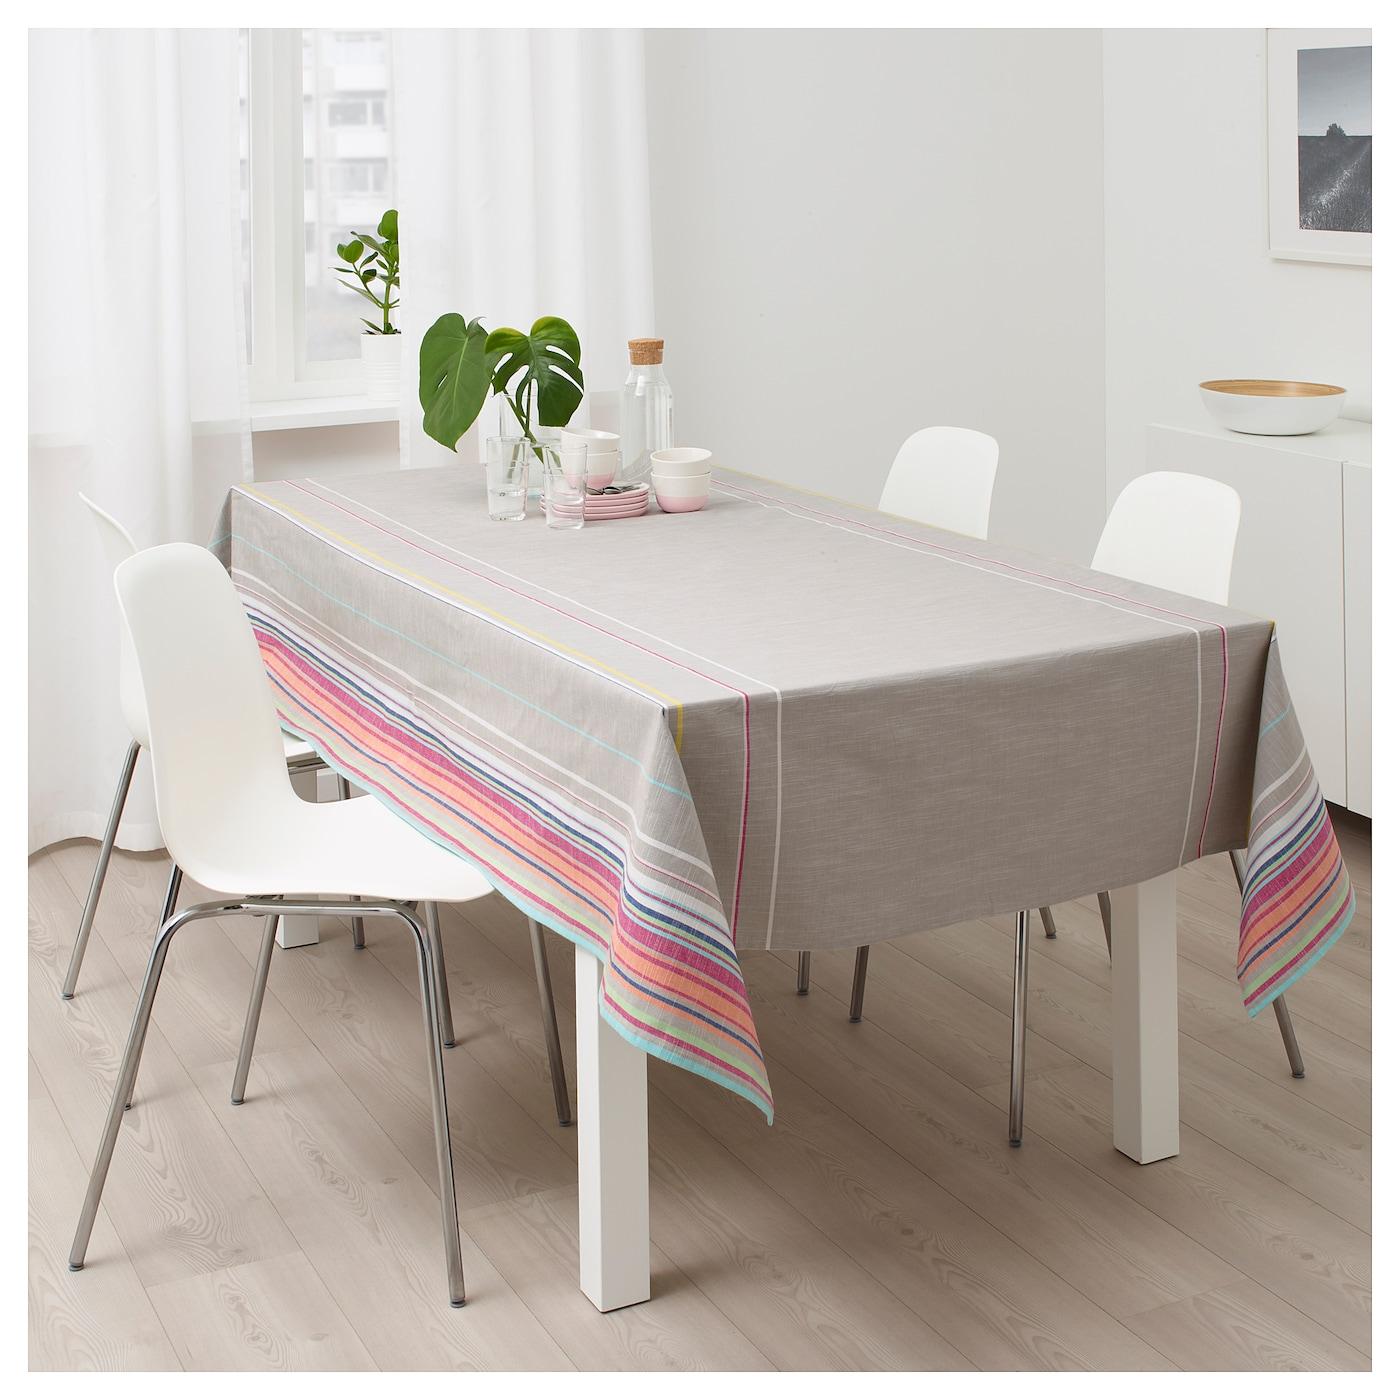 sommar 2018 tafellaken beige gestreept 145x240 cm ikea. Black Bedroom Furniture Sets. Home Design Ideas